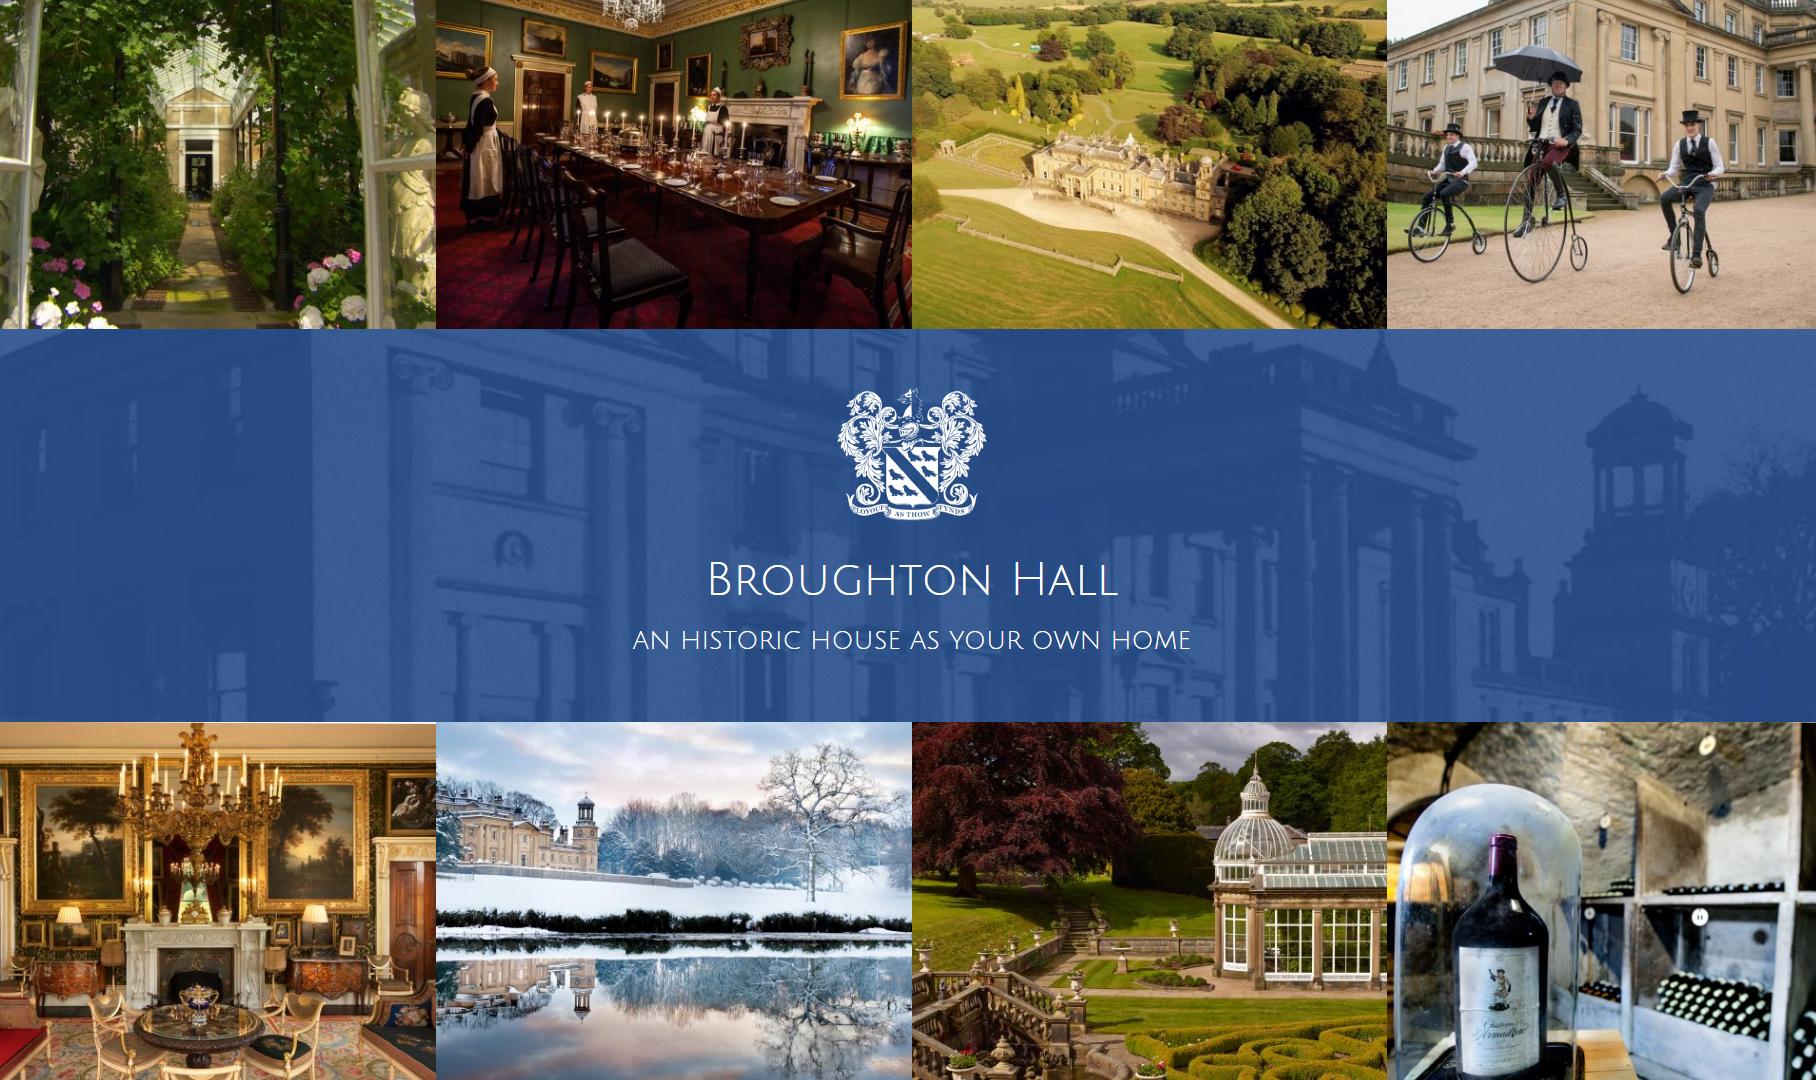 broughton-hall-the-hall-photos